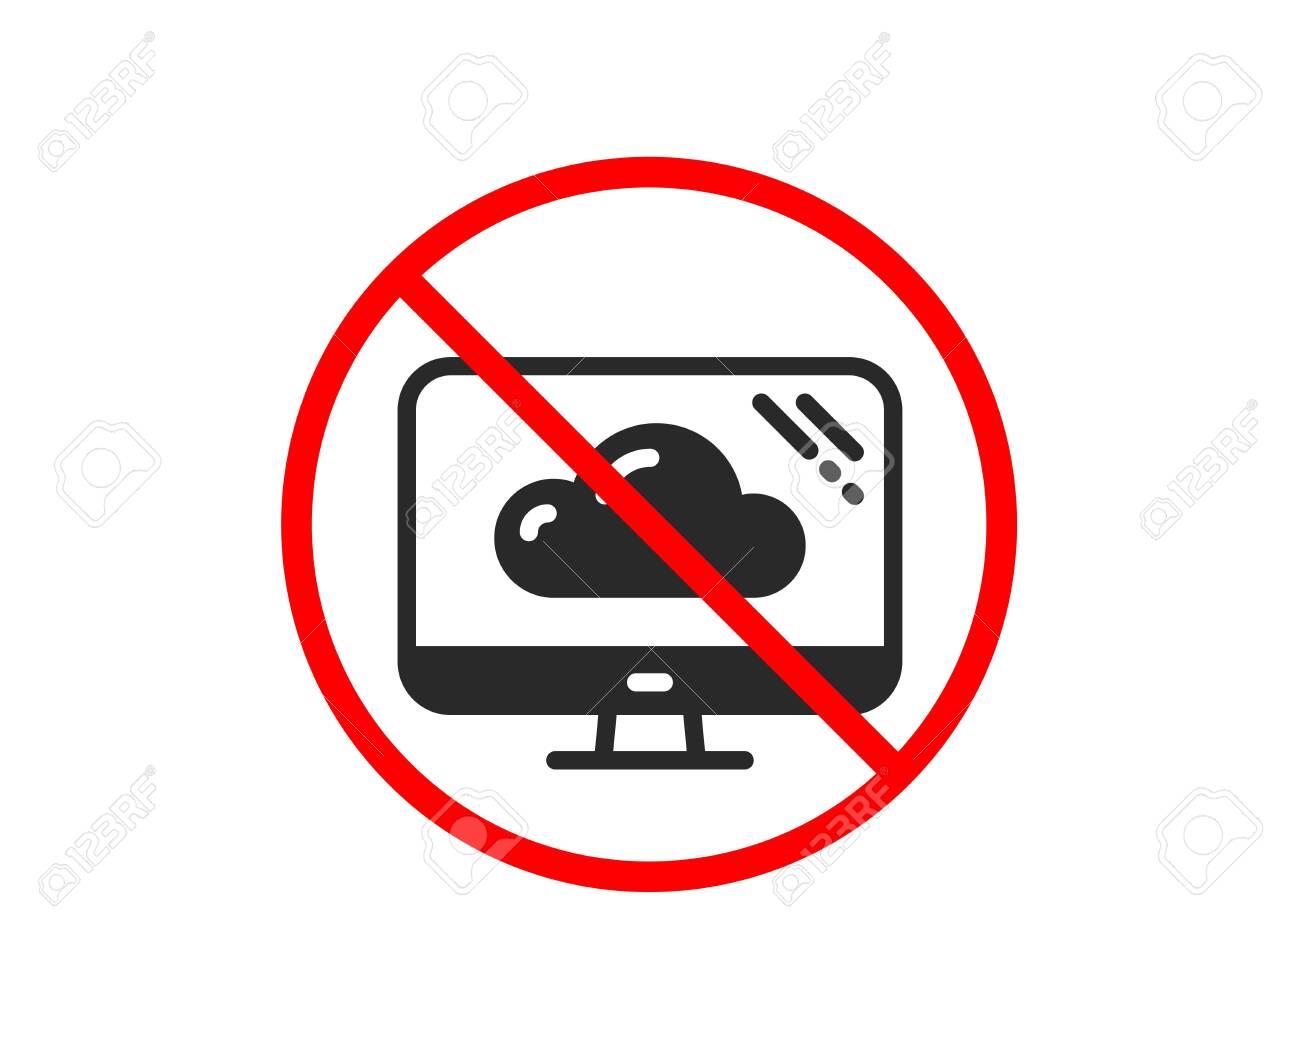 No or Stop. Computer icon. Cloud storage service sign. Monitor symbol. Prohibited ban stop symbol. No cloud storage icon. Vector - 124076018